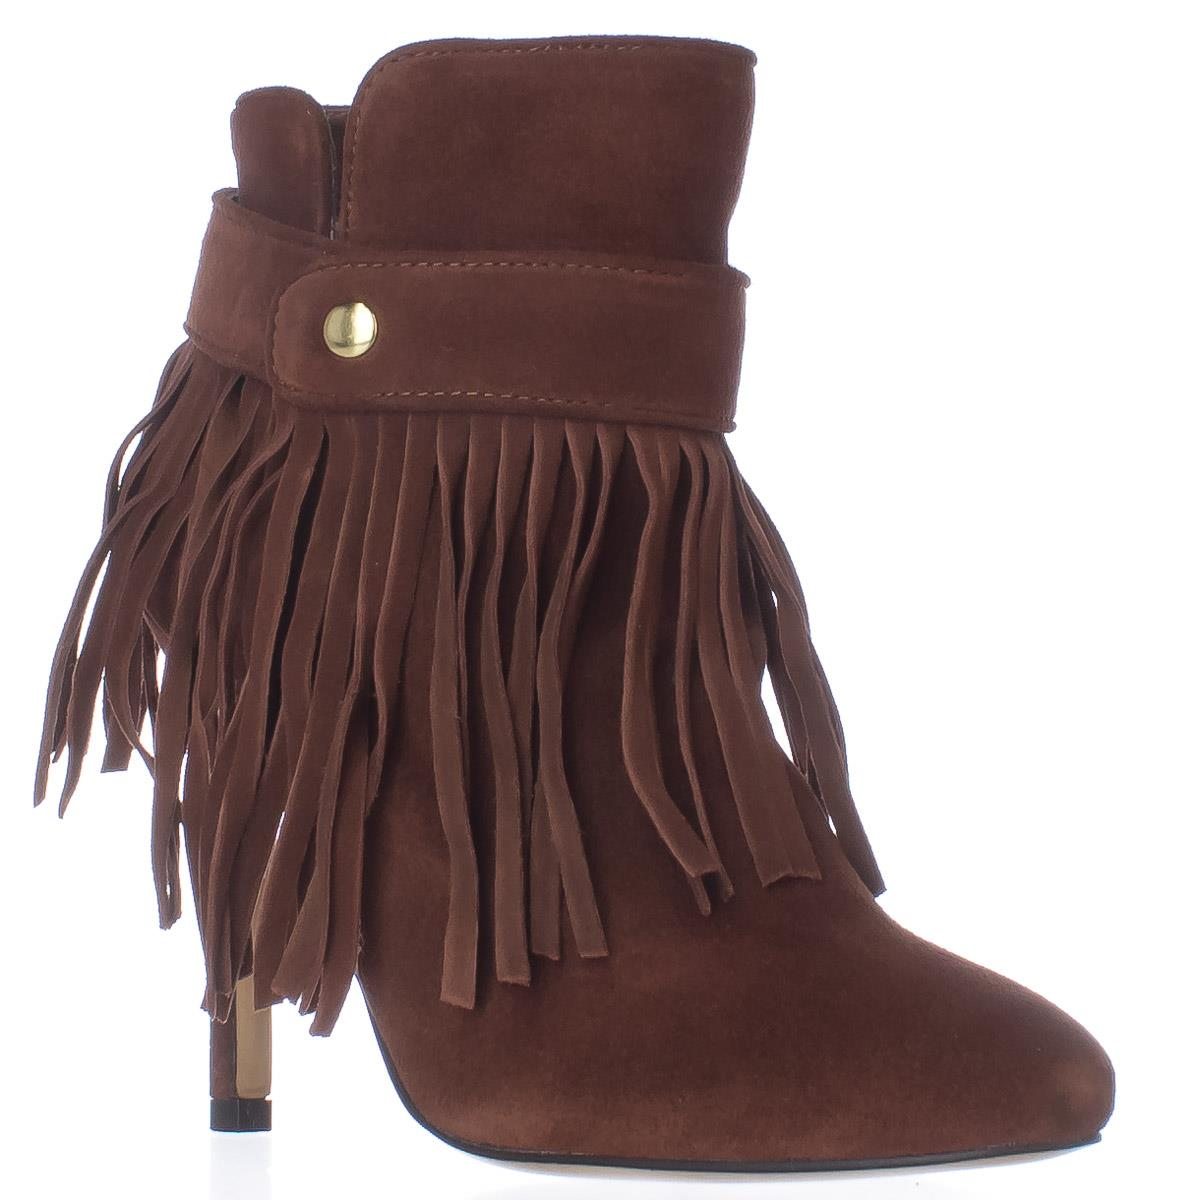 Womens June Ambrose 442761 Fringe Heeled US Ankle Boots, Cognac, 6 US Heeled aa3cbe